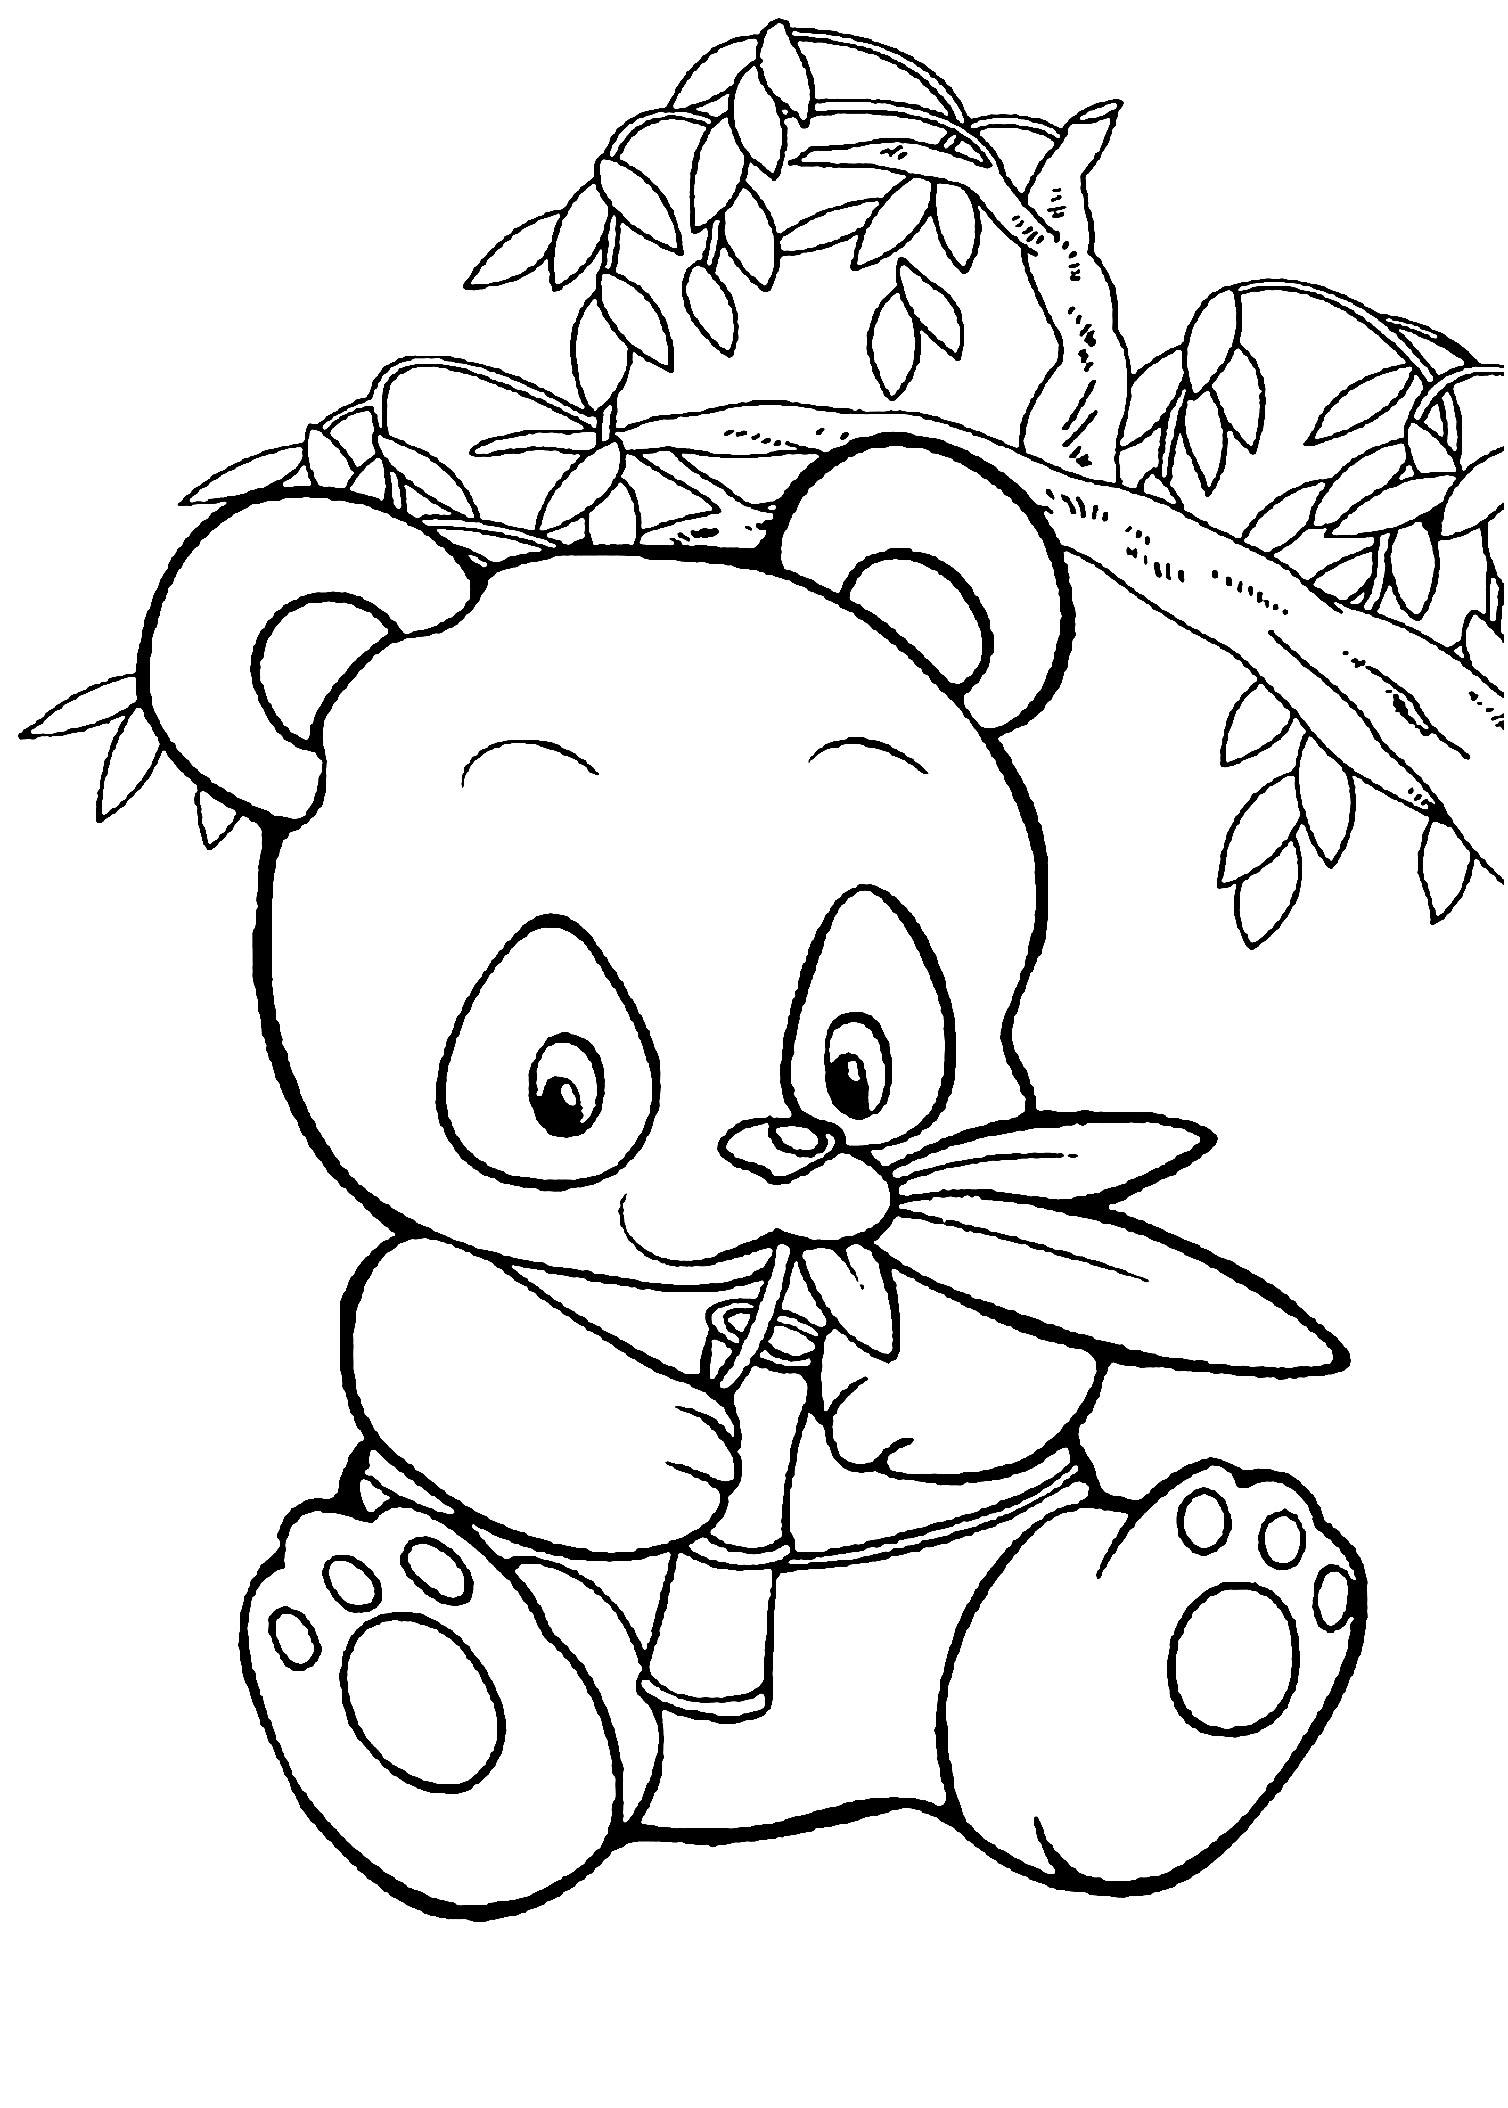 Pandas To Color For Kids Pandas Kids Coloring Pages